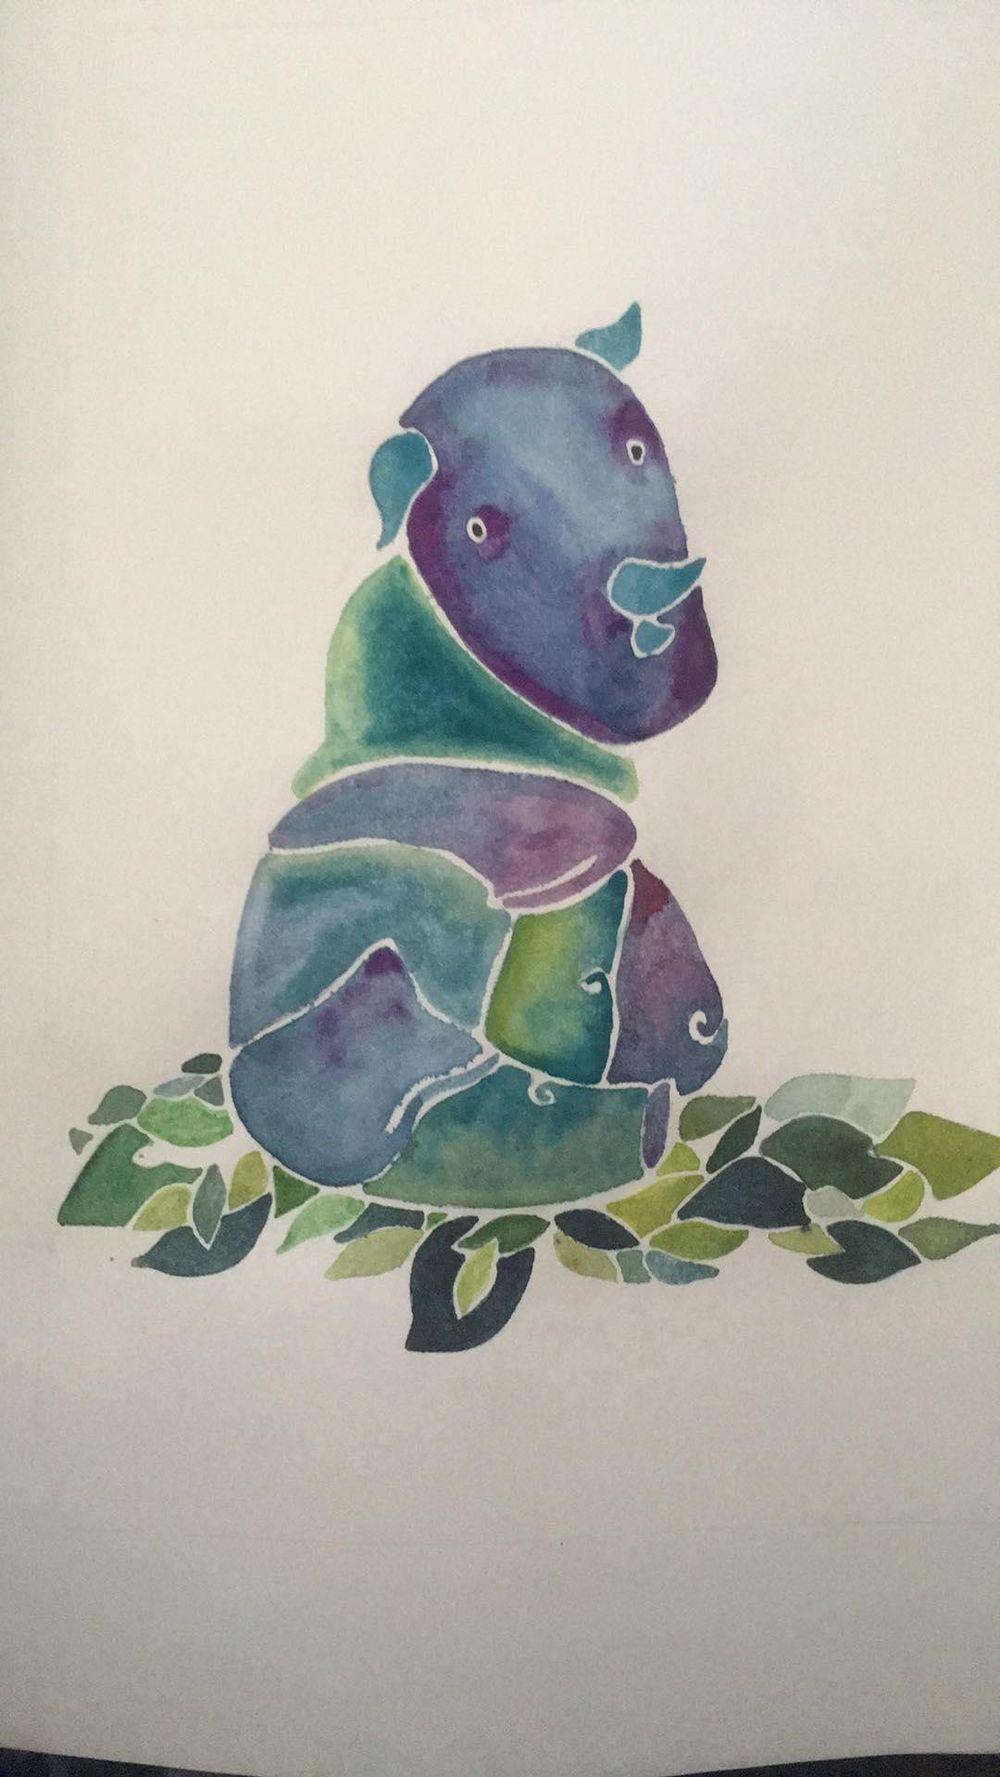 Rhino - image 1 - student project